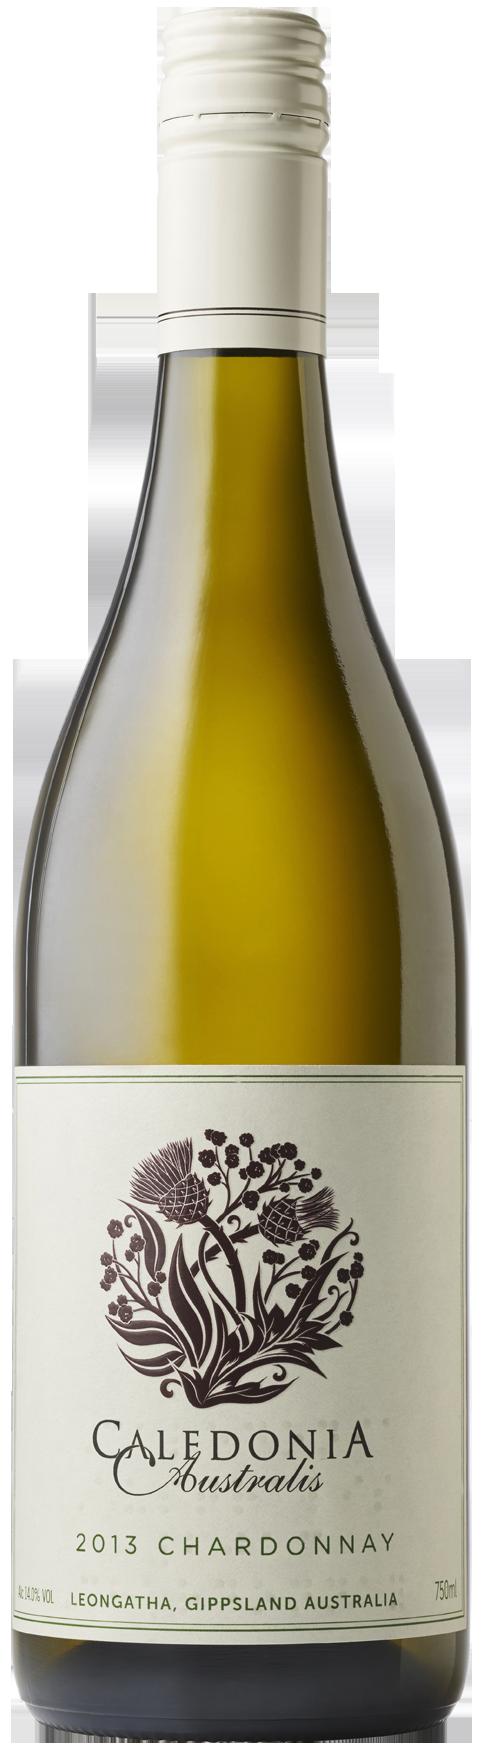 Caledonia Australis Chardonnay 2013